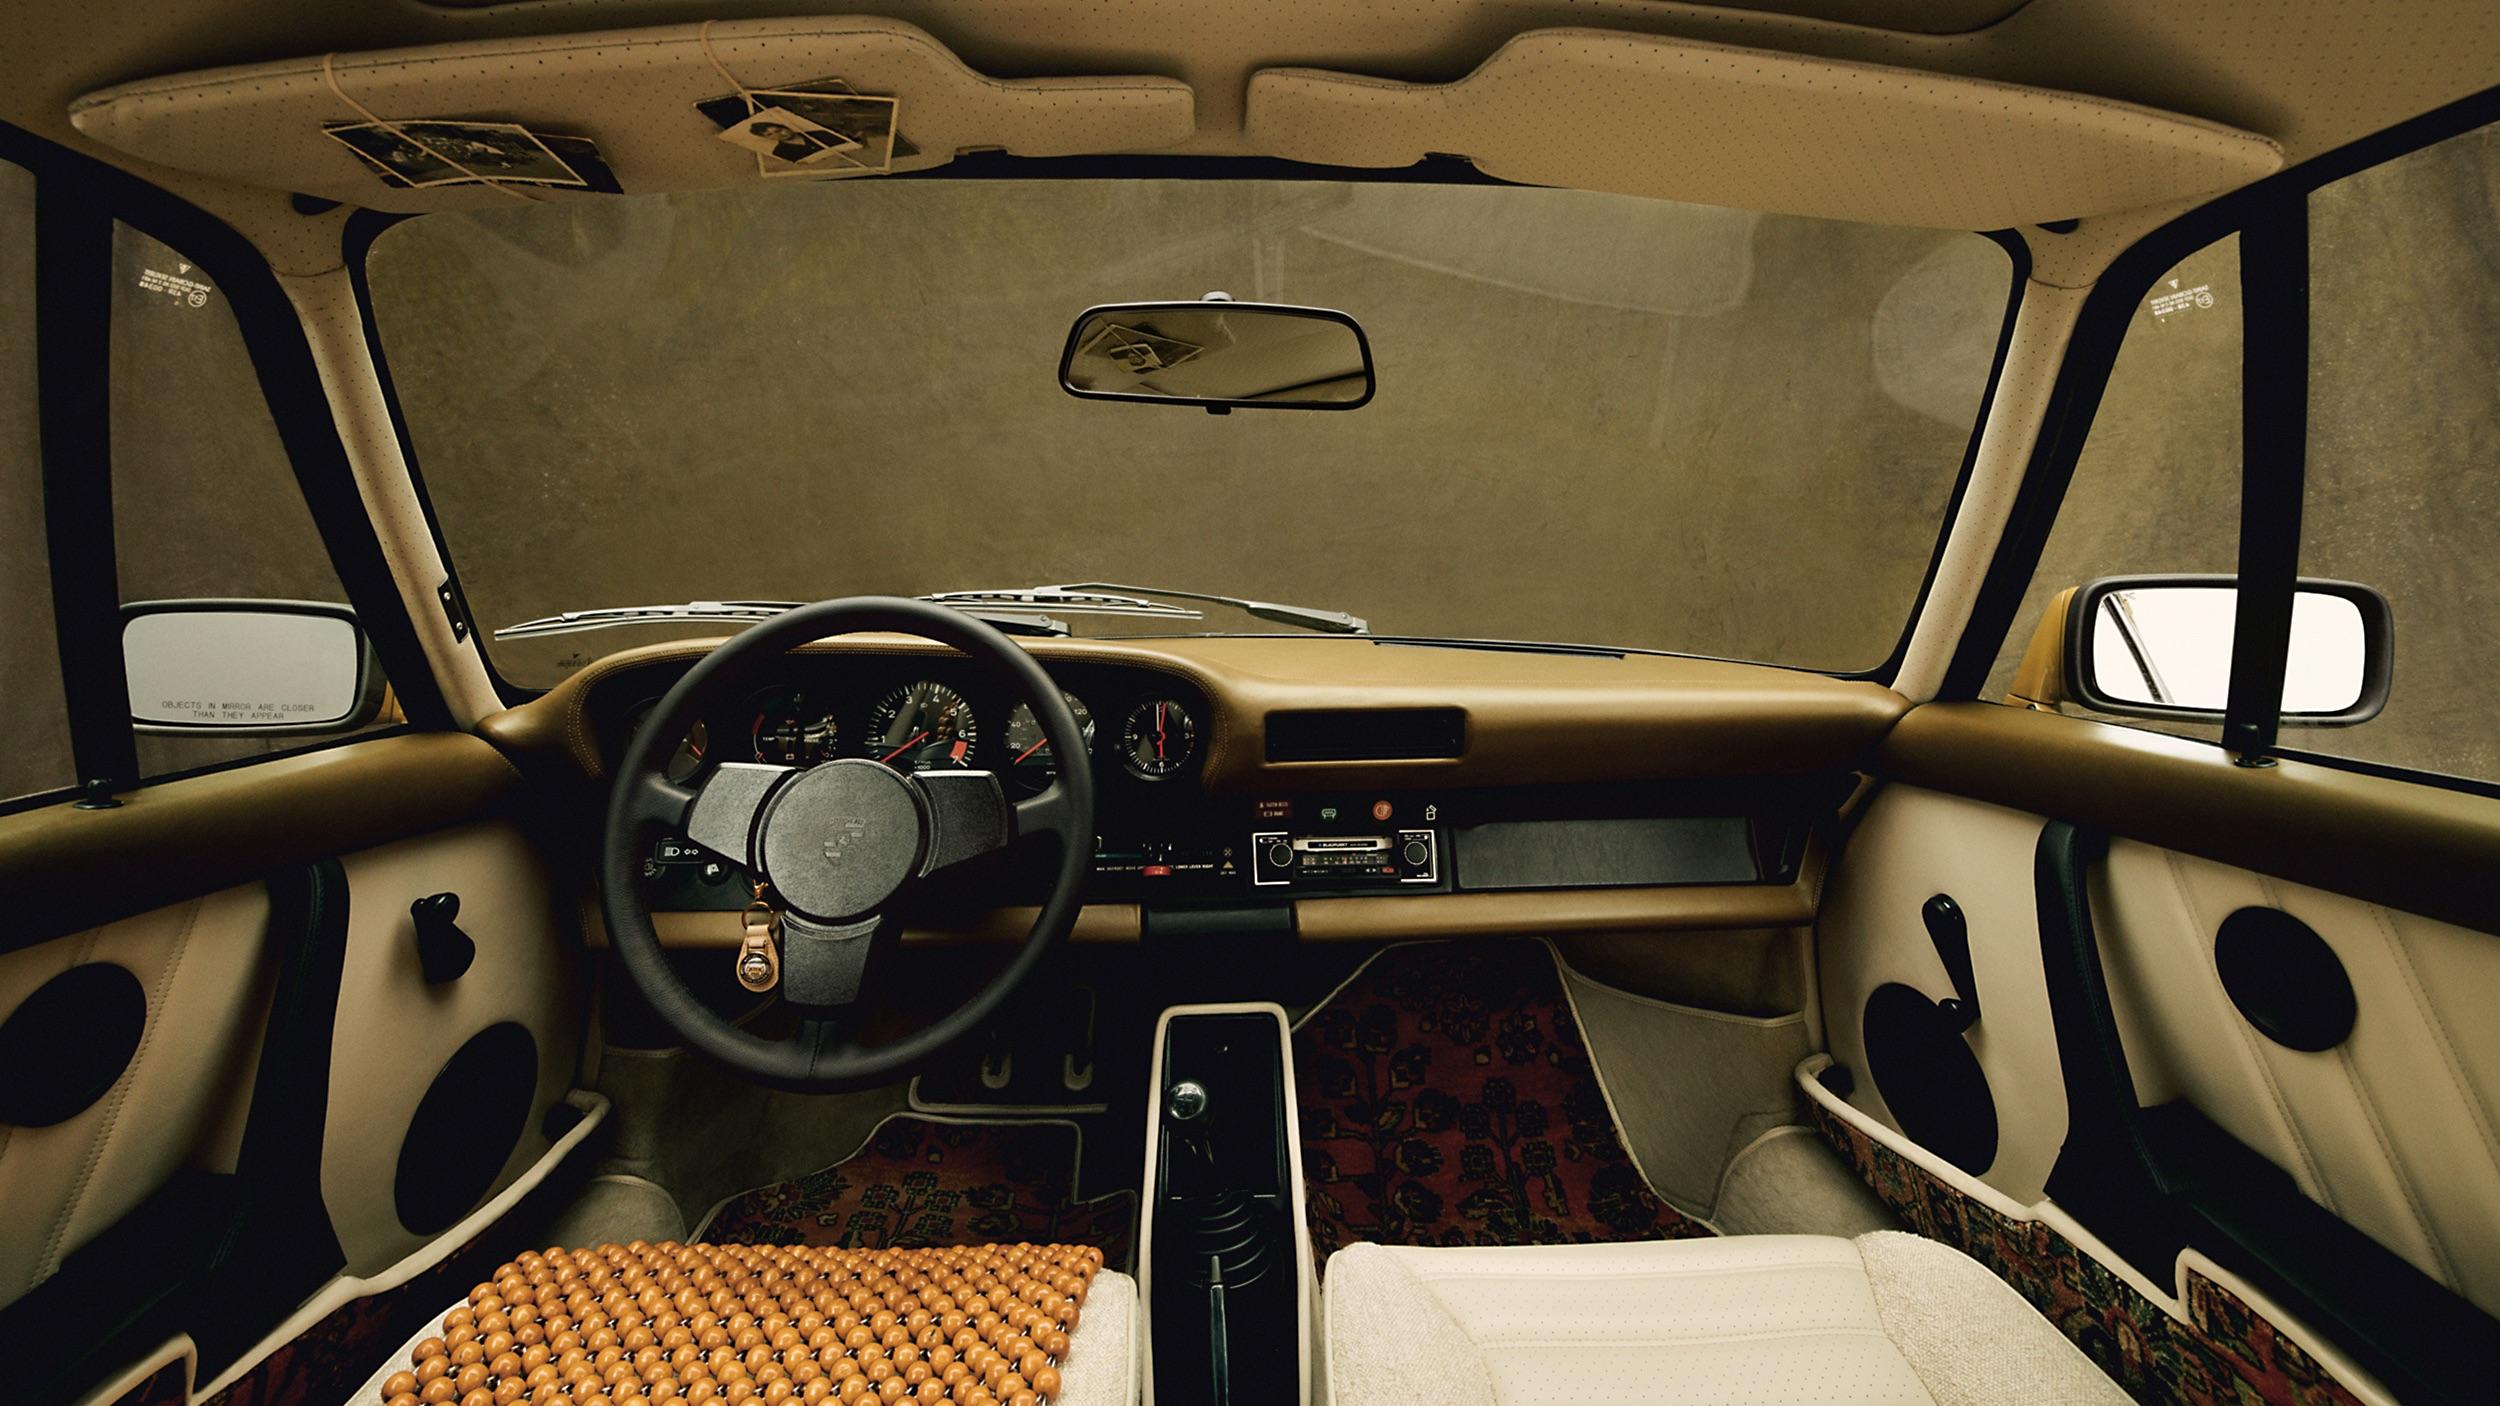 Porsche 911 ALD interior